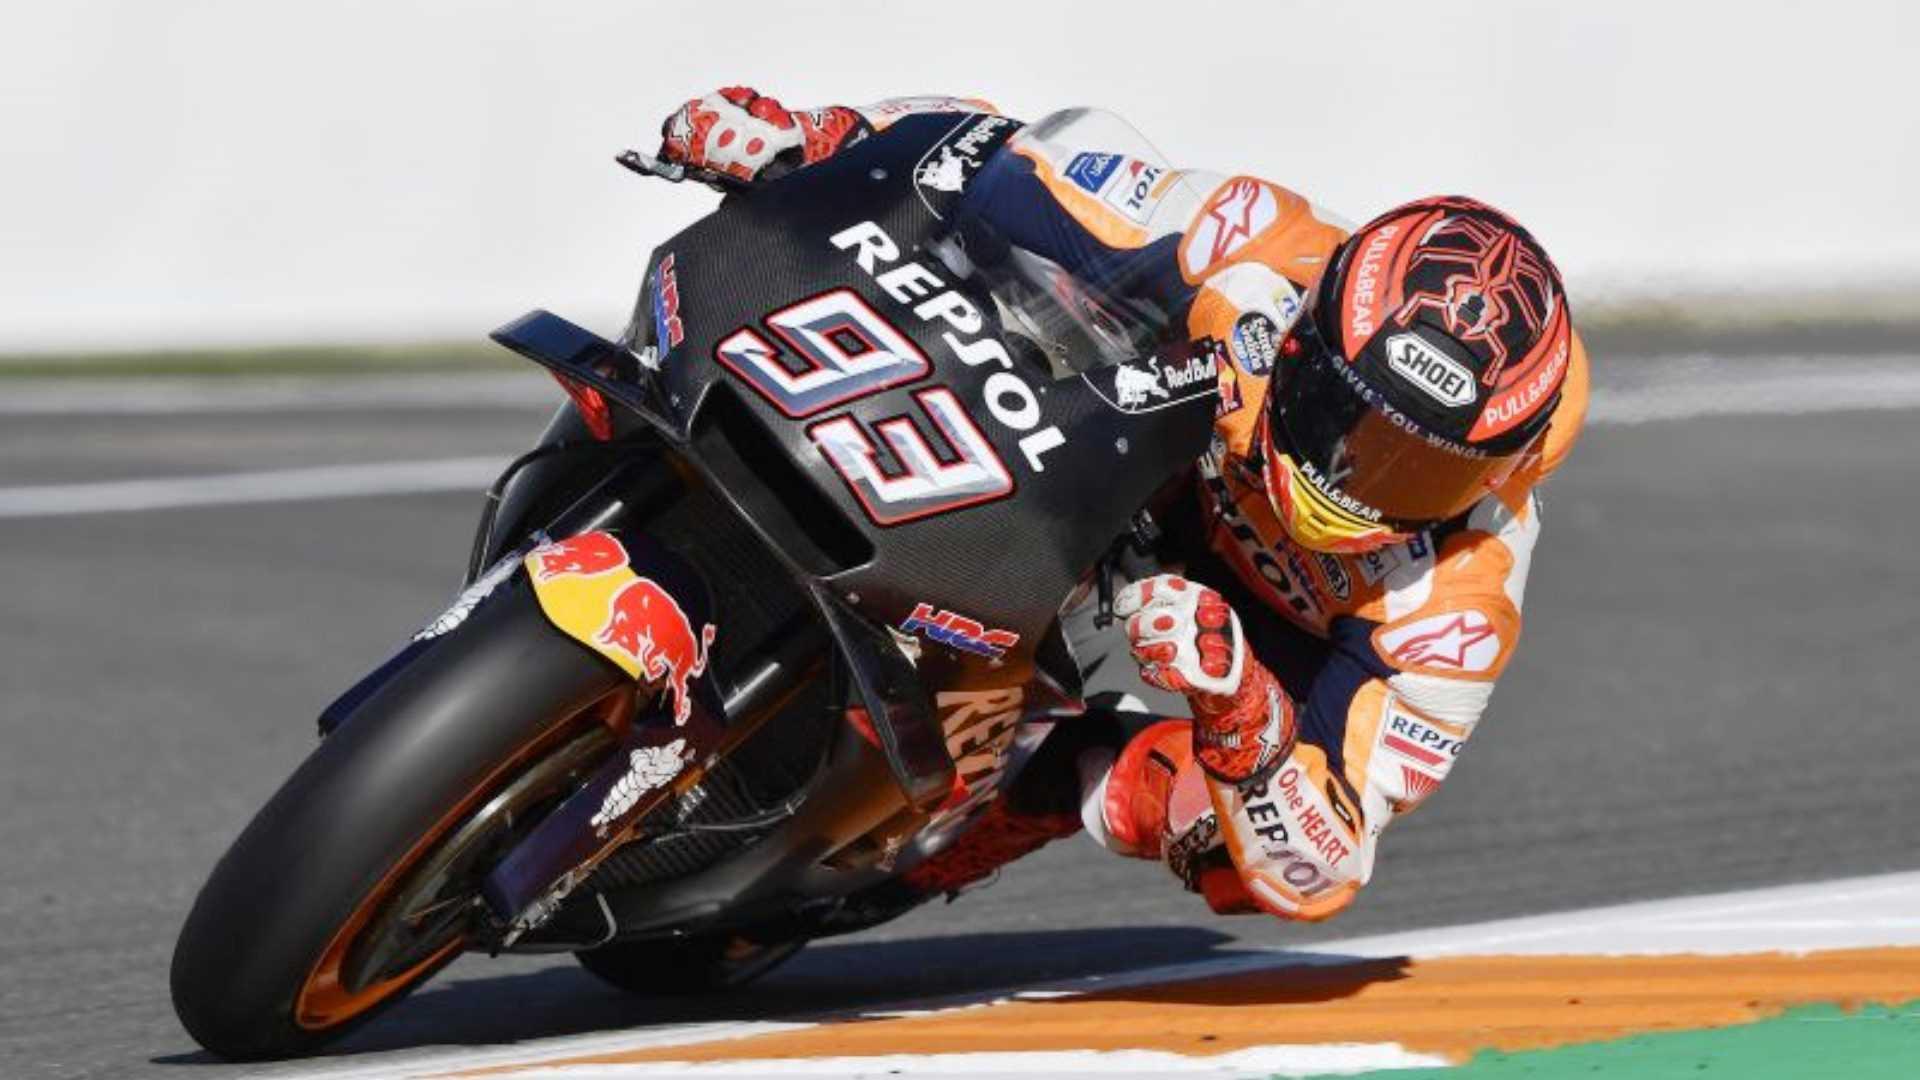 Vinales Dovi And Marquez Fast In 2019 Motogp Testing